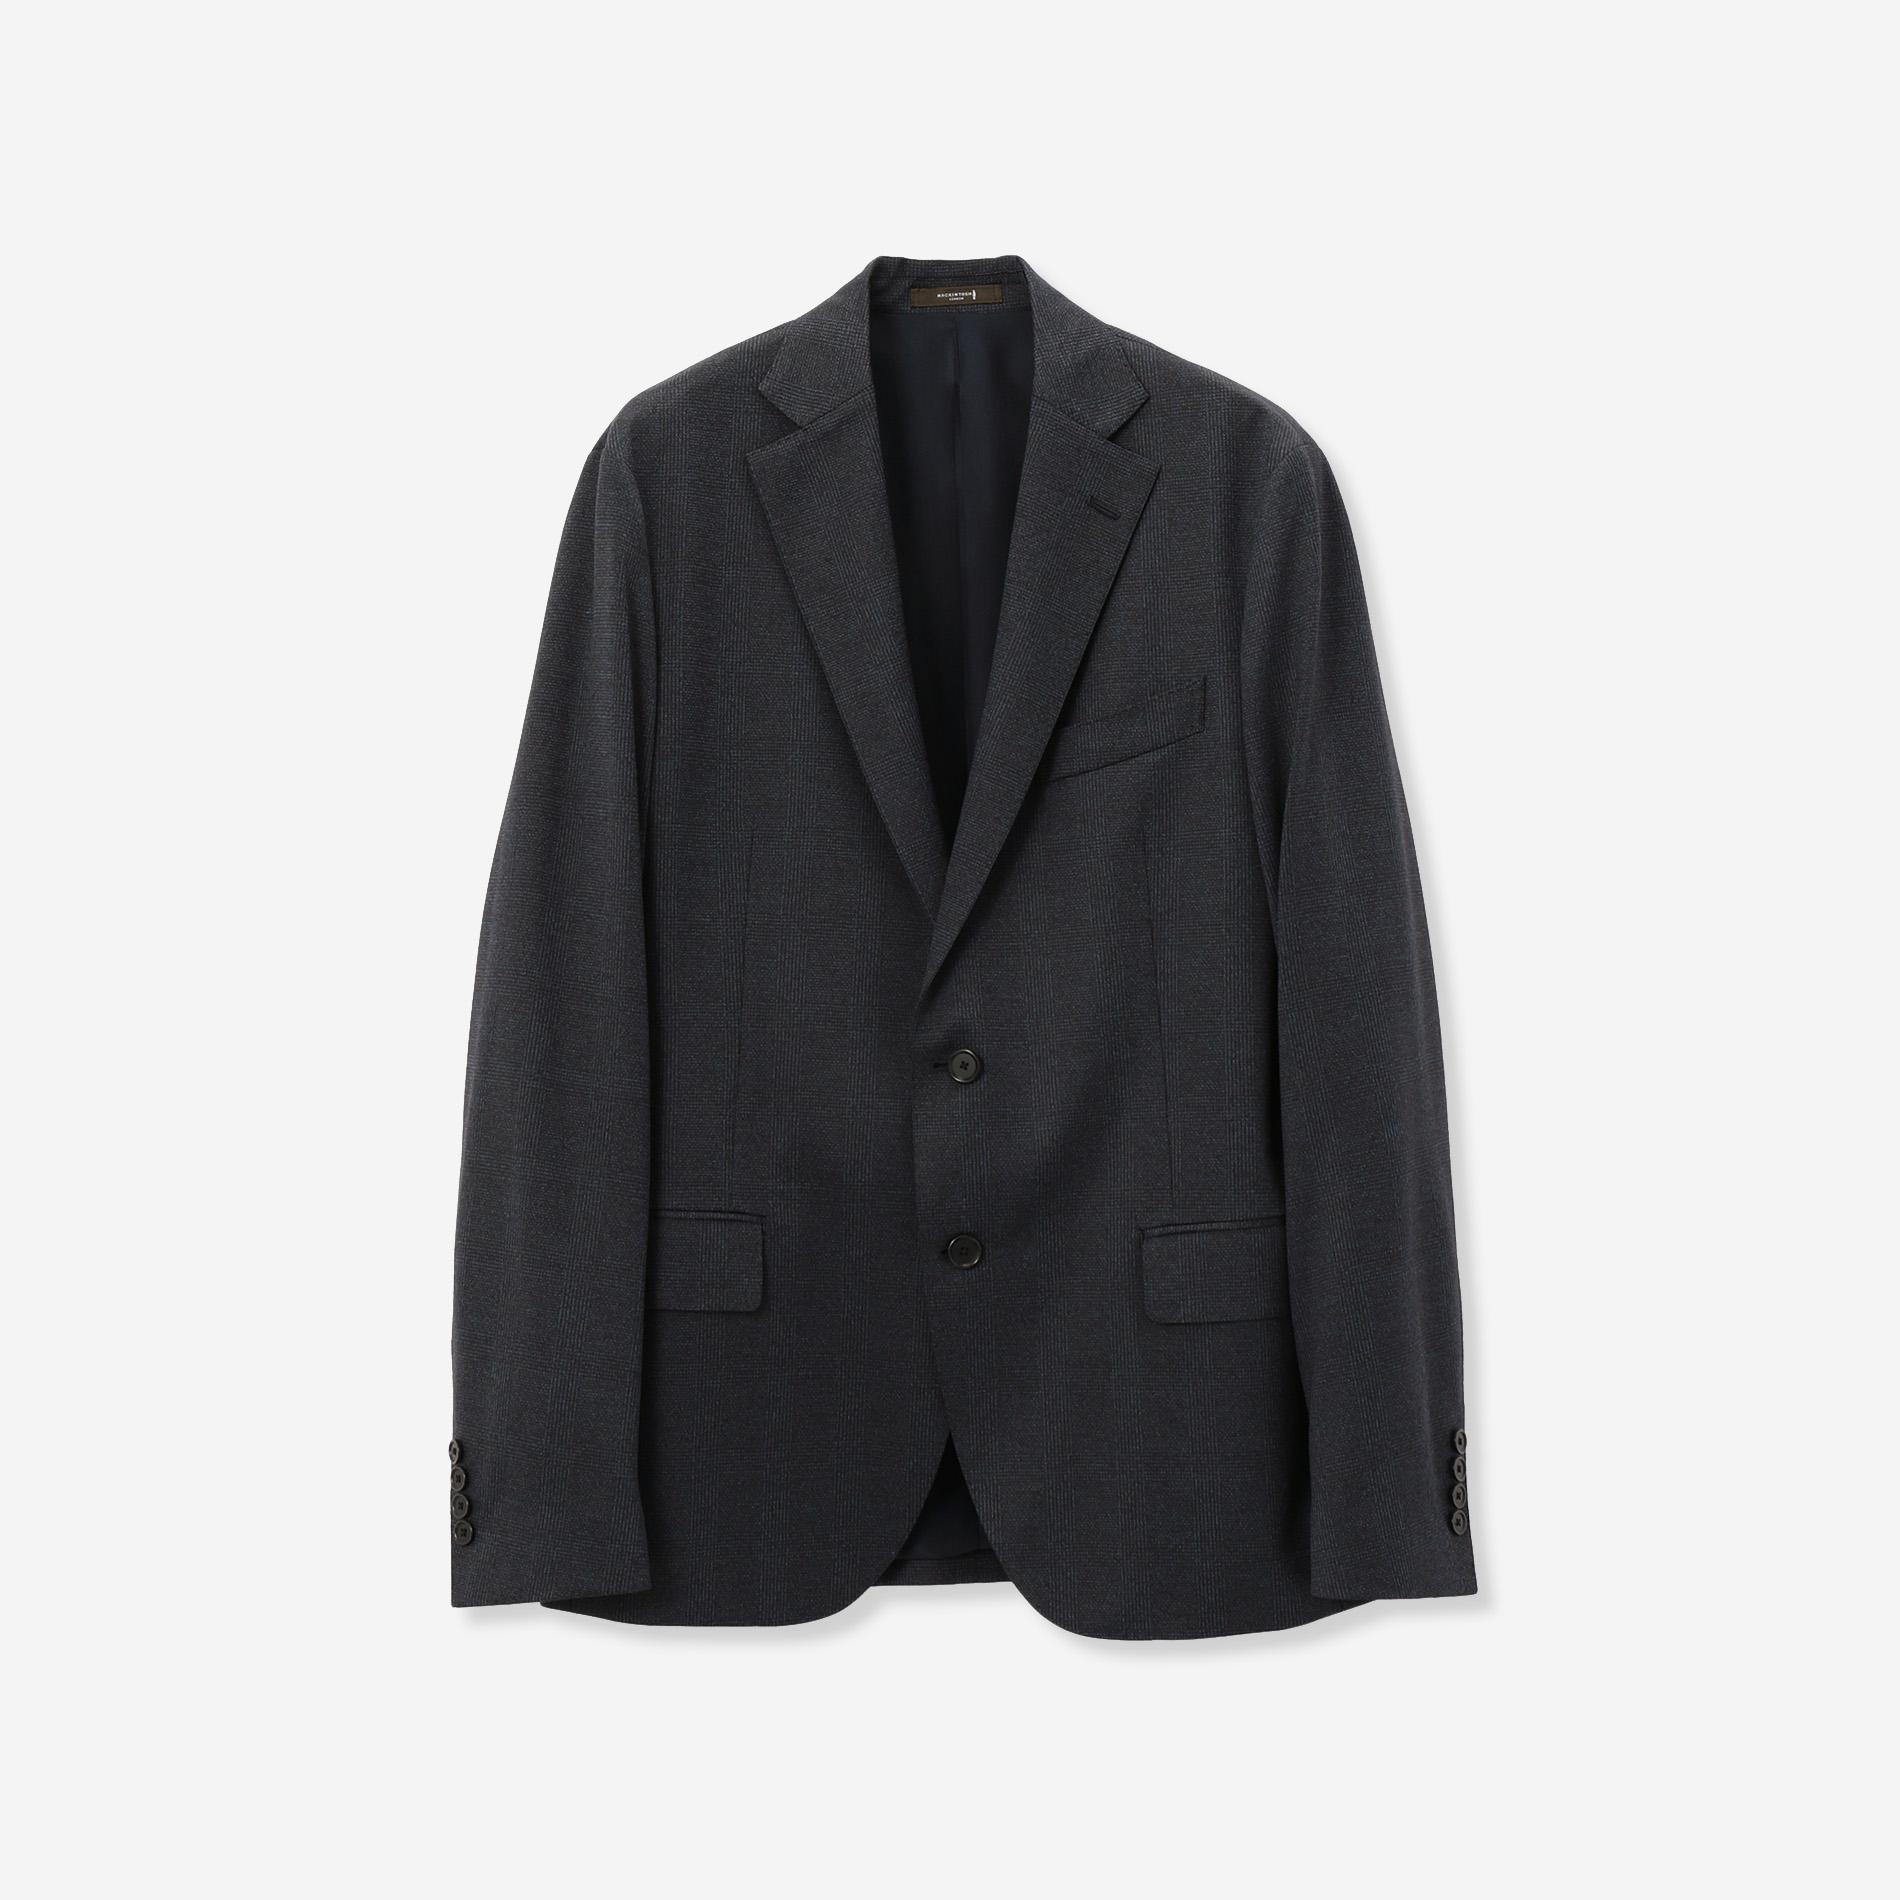 【NEW BRIDGE】【FLEX JERSEY】グレンチェックジャケット